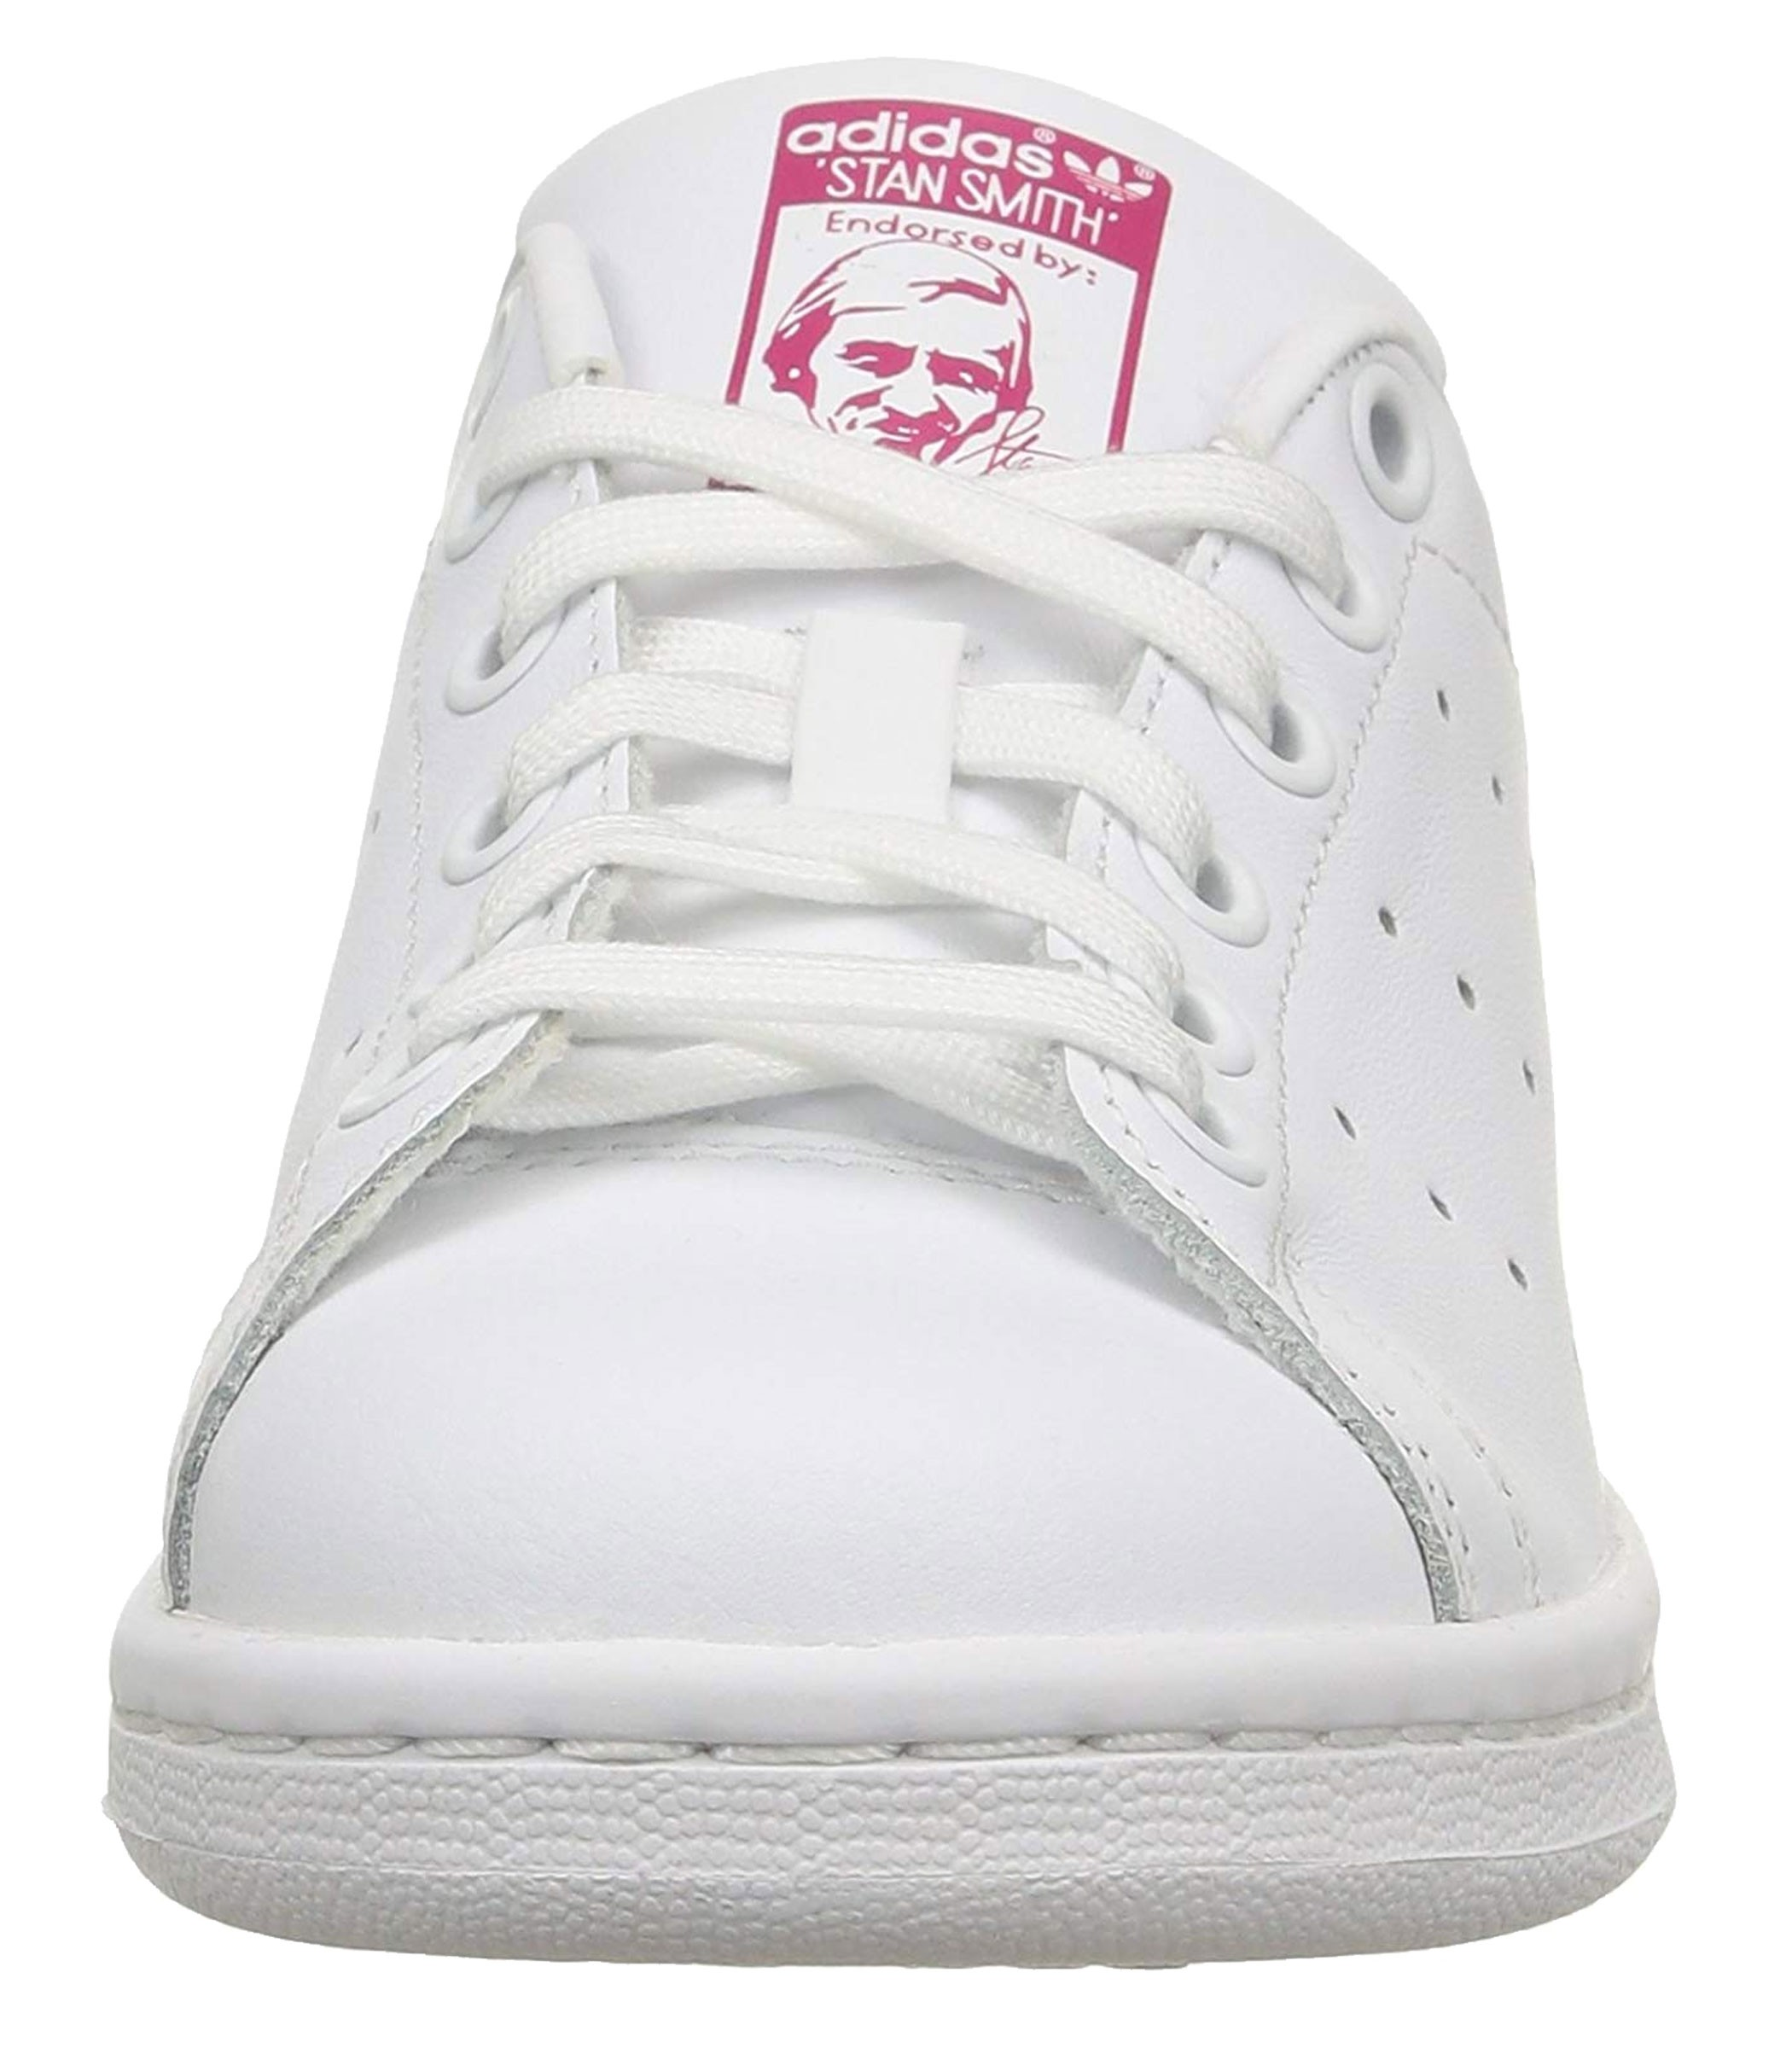 buy popular 69f2e 83cdc Scarpe Sneakers Adidas Stan Smith da Ragazza Rif. B32703